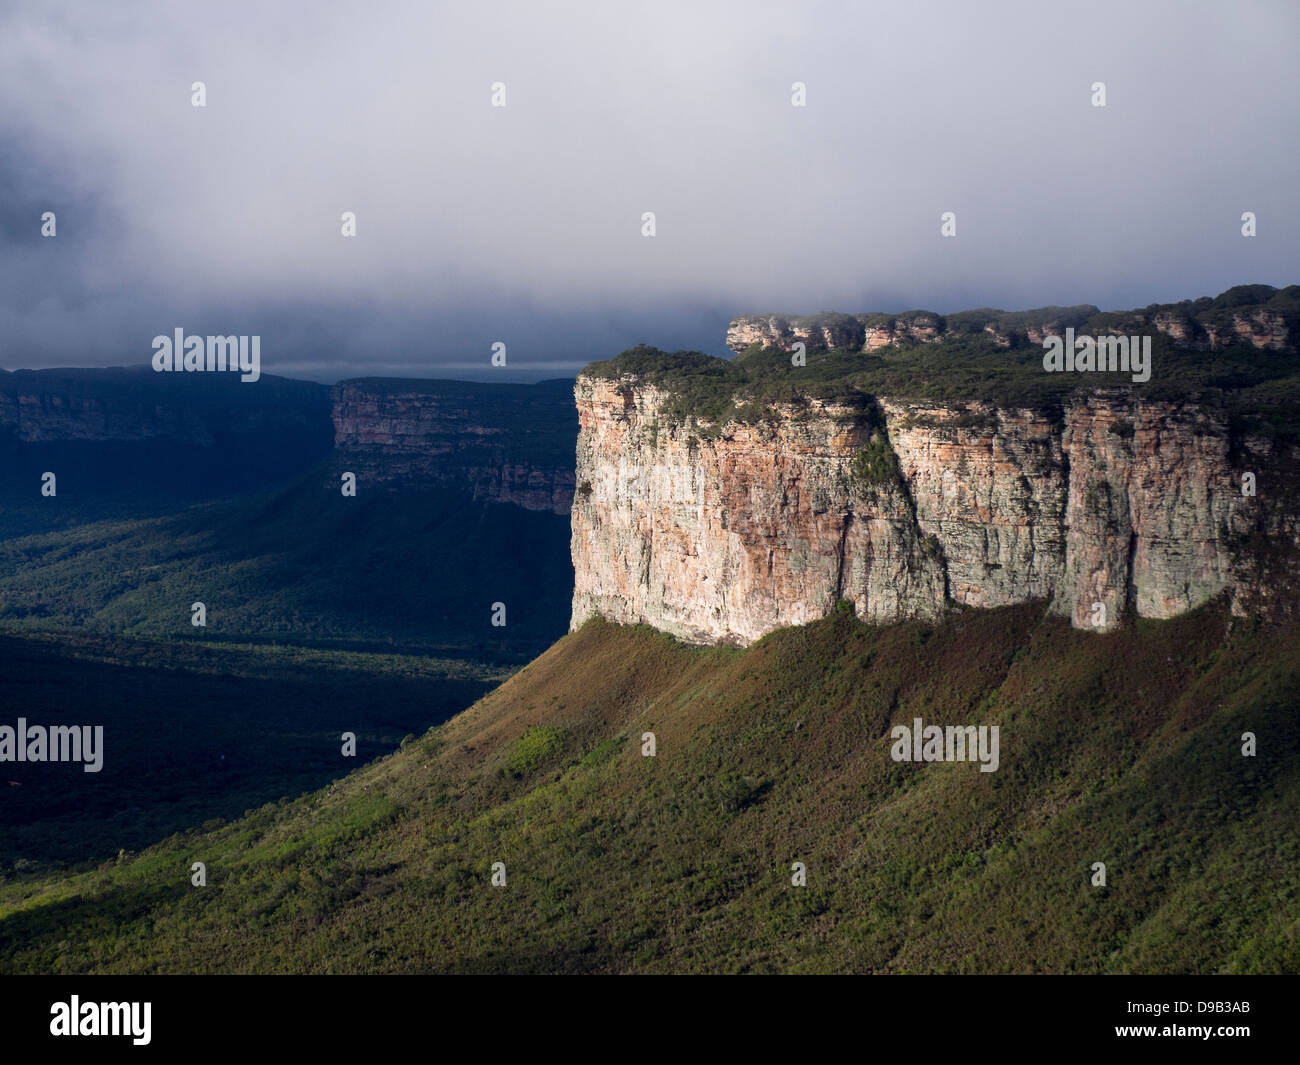 Chapada Diamantina National Park in Brazil. - Stock Image